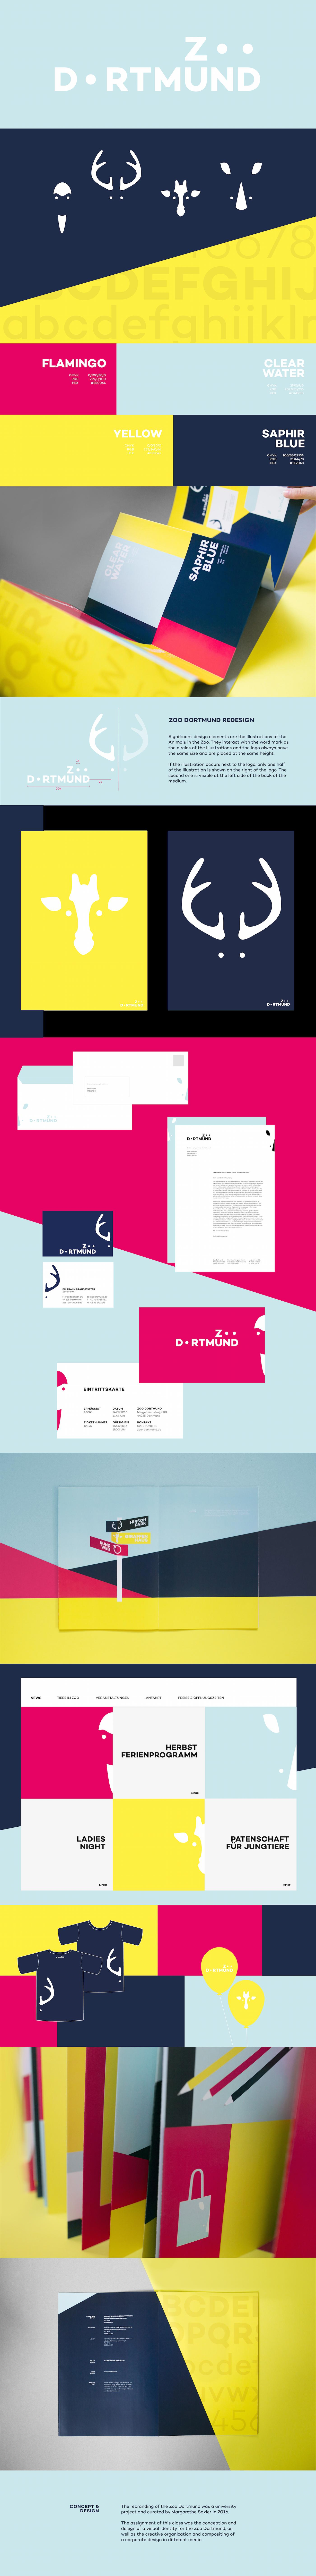 Corporate Design manual zoo minimal ILLUSTRATION  colorful animal redesign identity